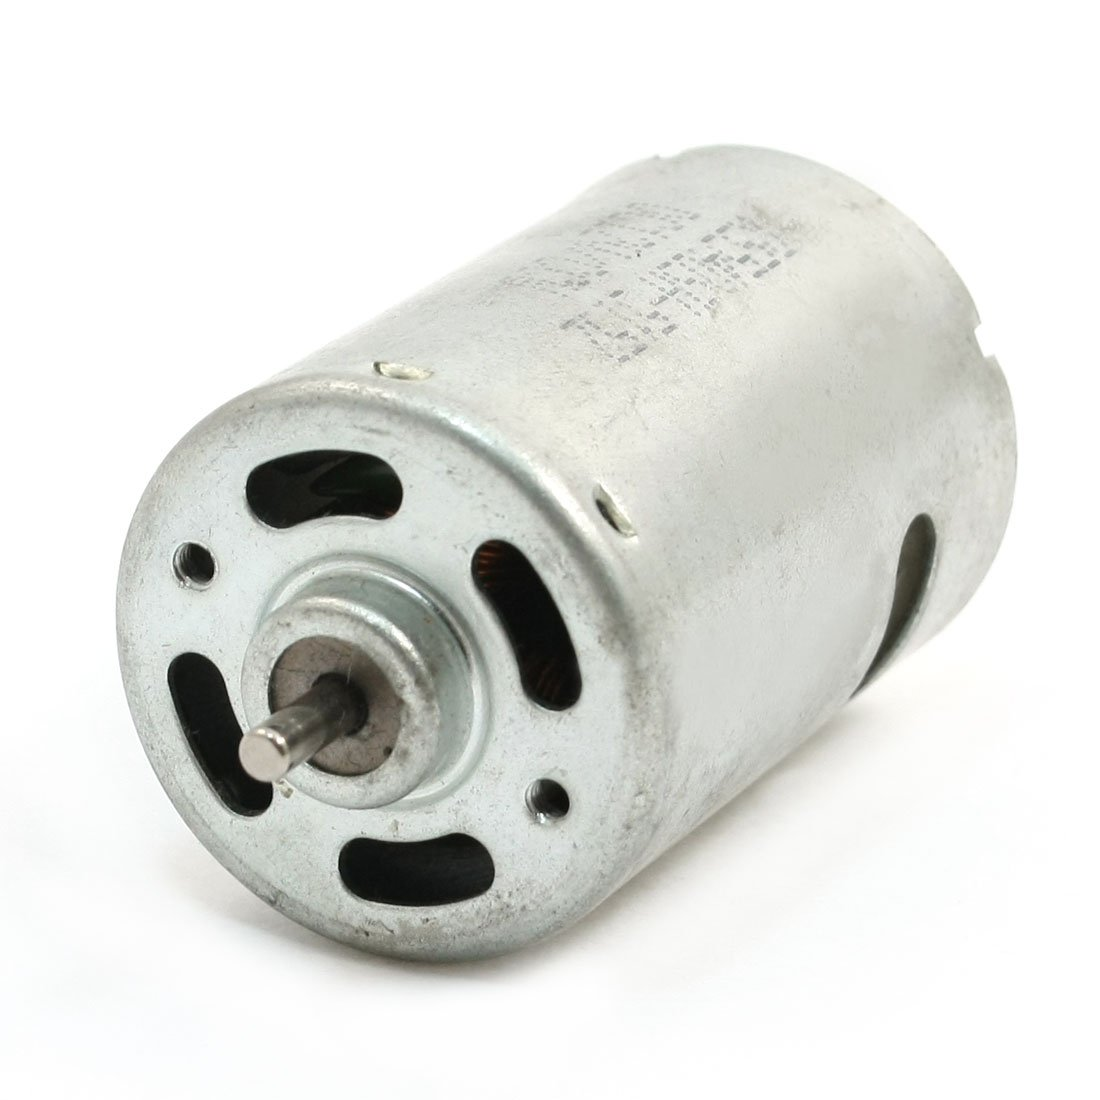 36x54mm Body Magnetic 12V 10000RPM RS550 Garden Tool Magnetic DC Motor